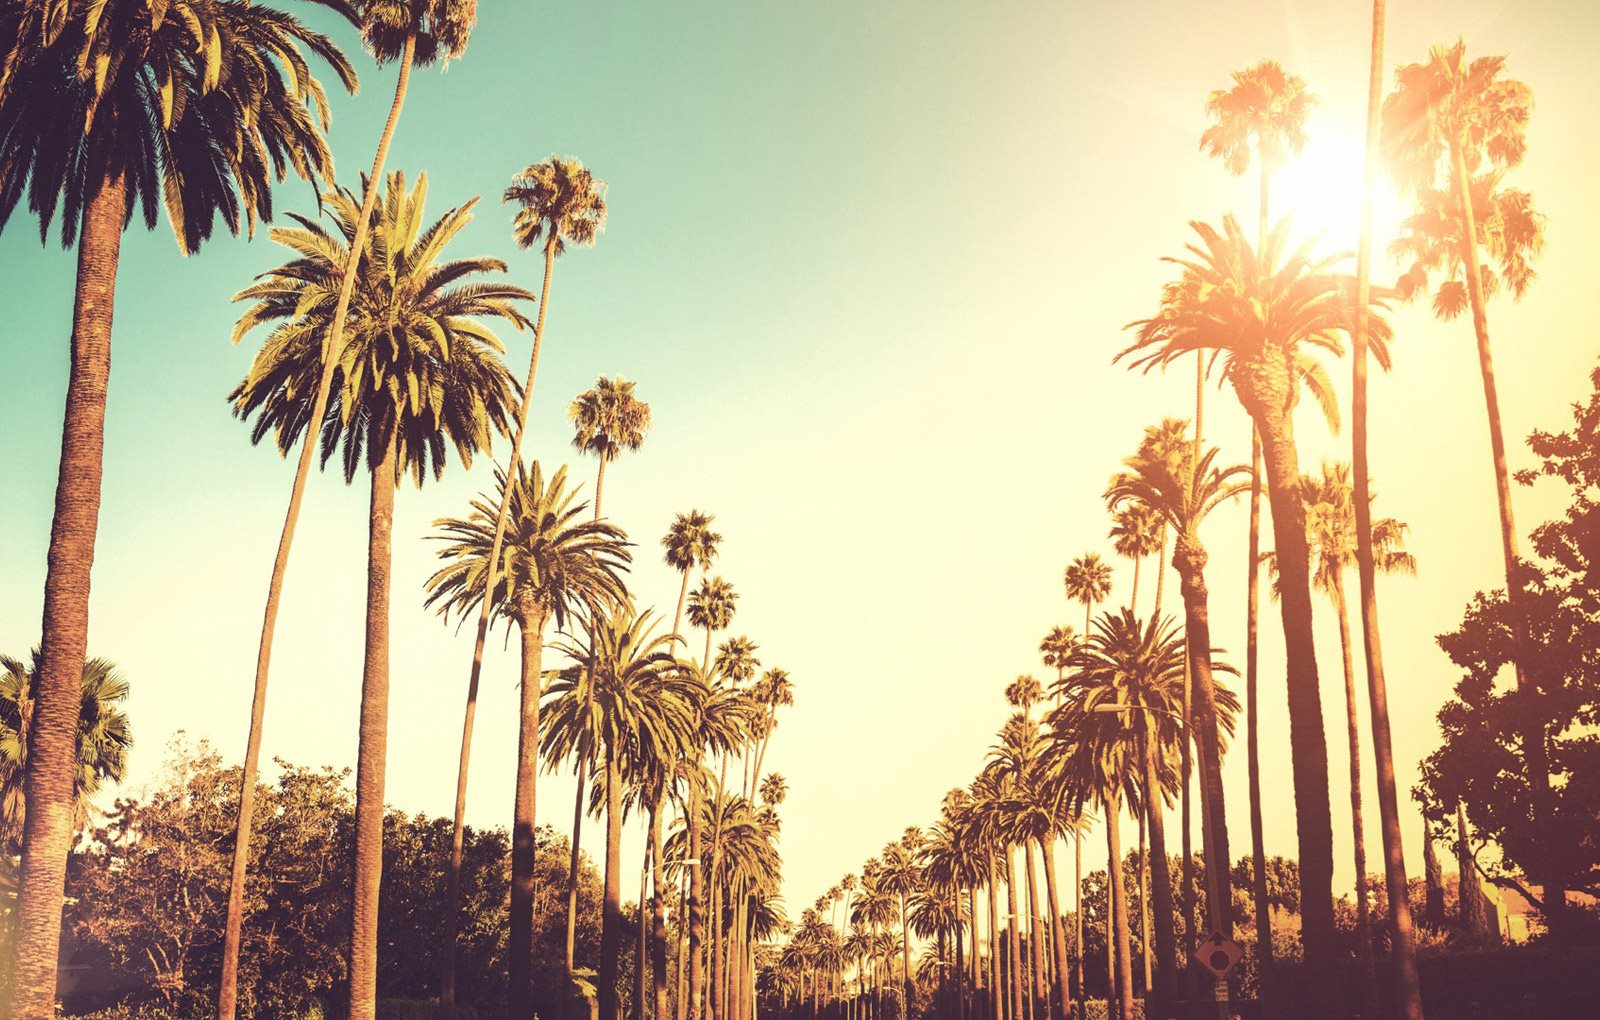 Los Angeles background 1